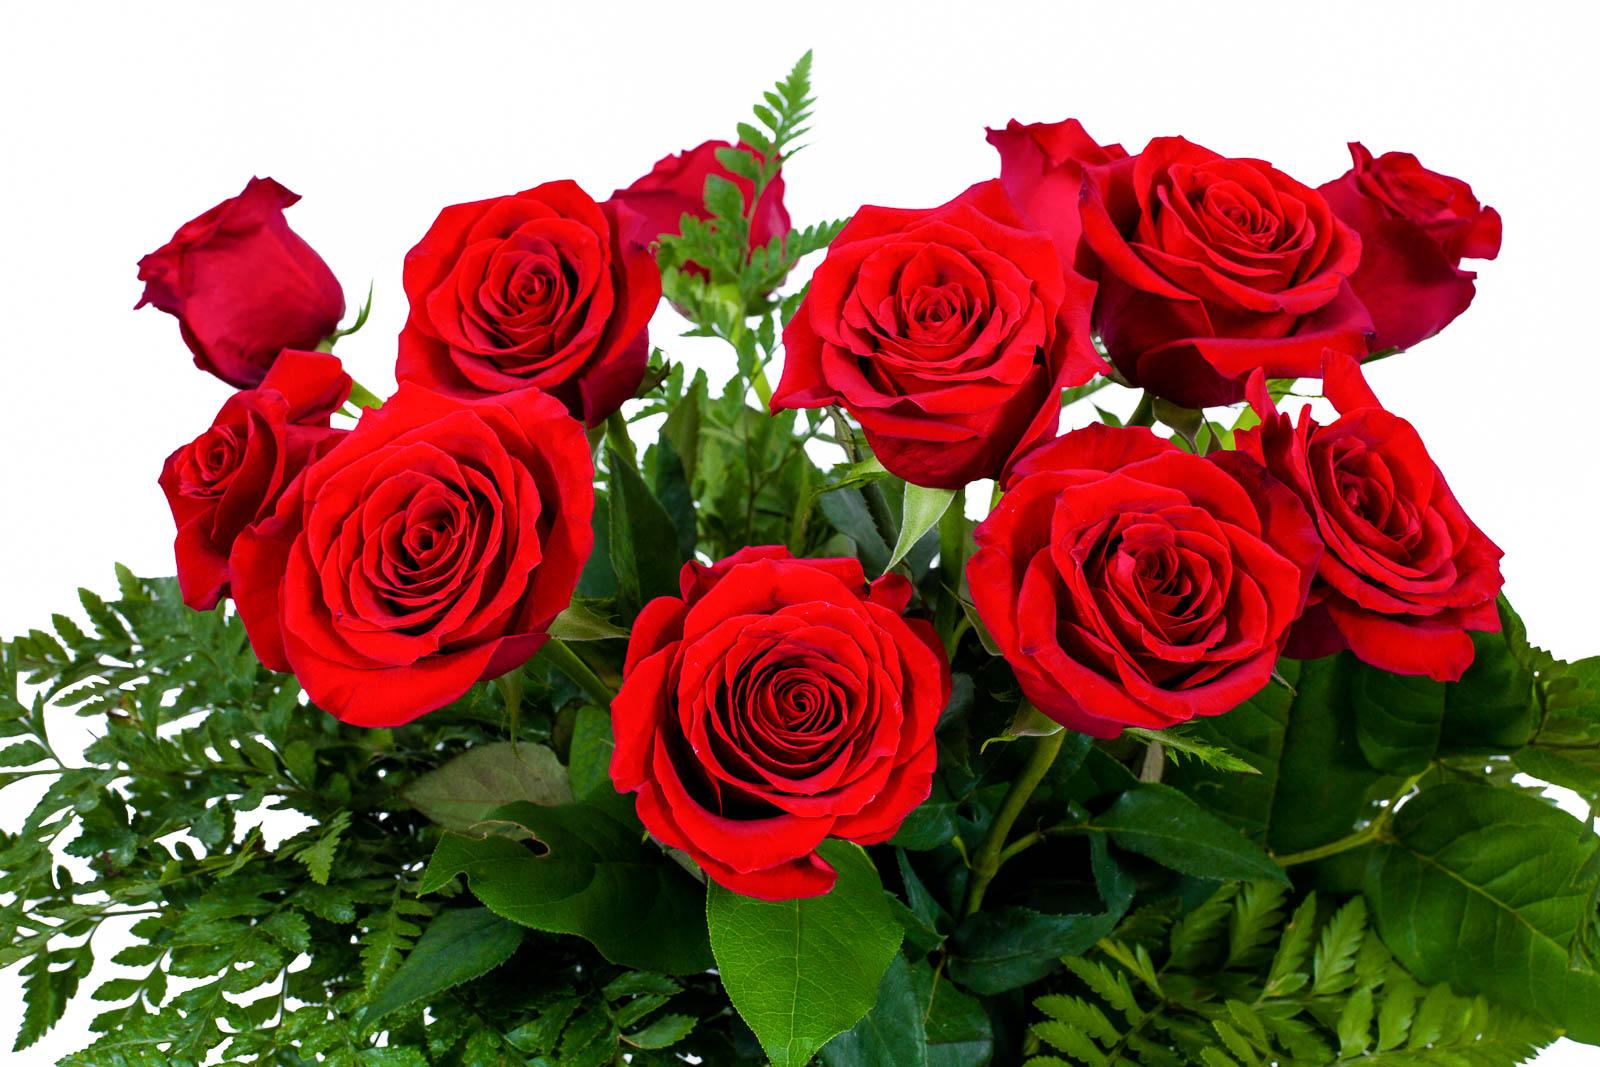 Flwerz 1 dozen roses long stem fresh cut luxury bouquet arrangement flwerz 1 dozen roses long stem fresh cut izmirmasajfo Choice Image